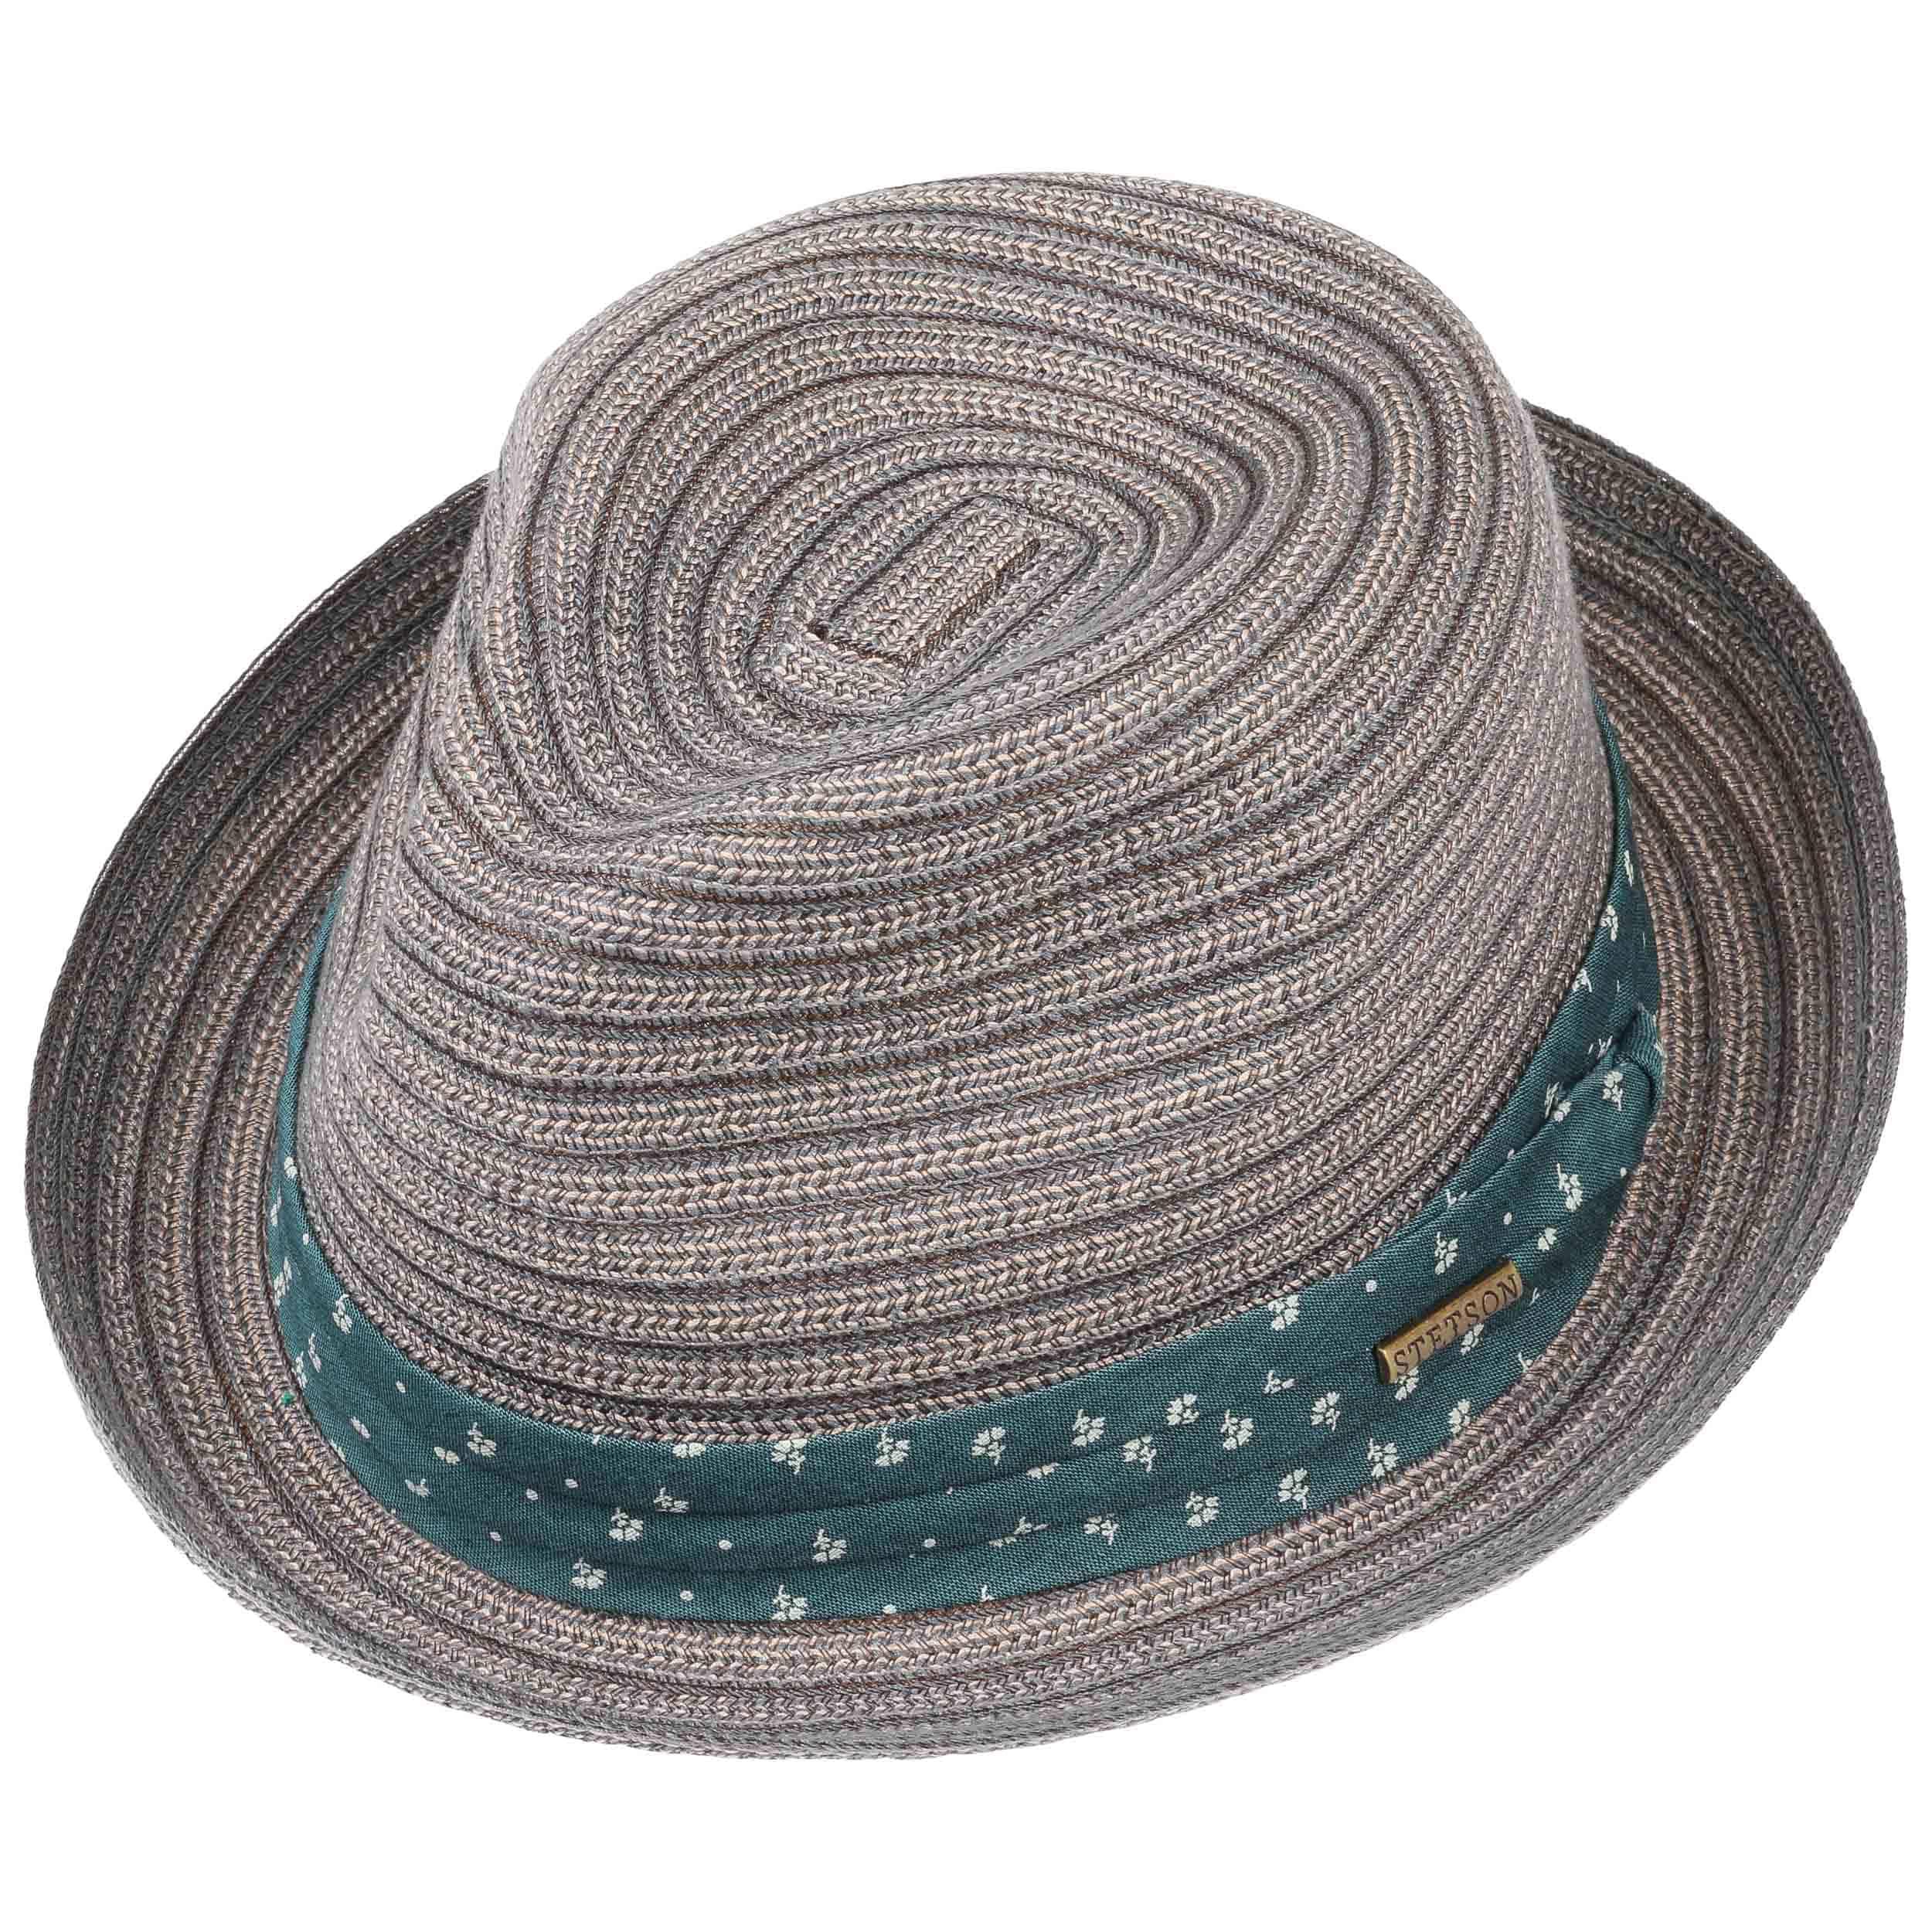 Stripe Braid Player Hat Cloth Hat by Stetson - blue-grey 1 ... 3c11e2a82089